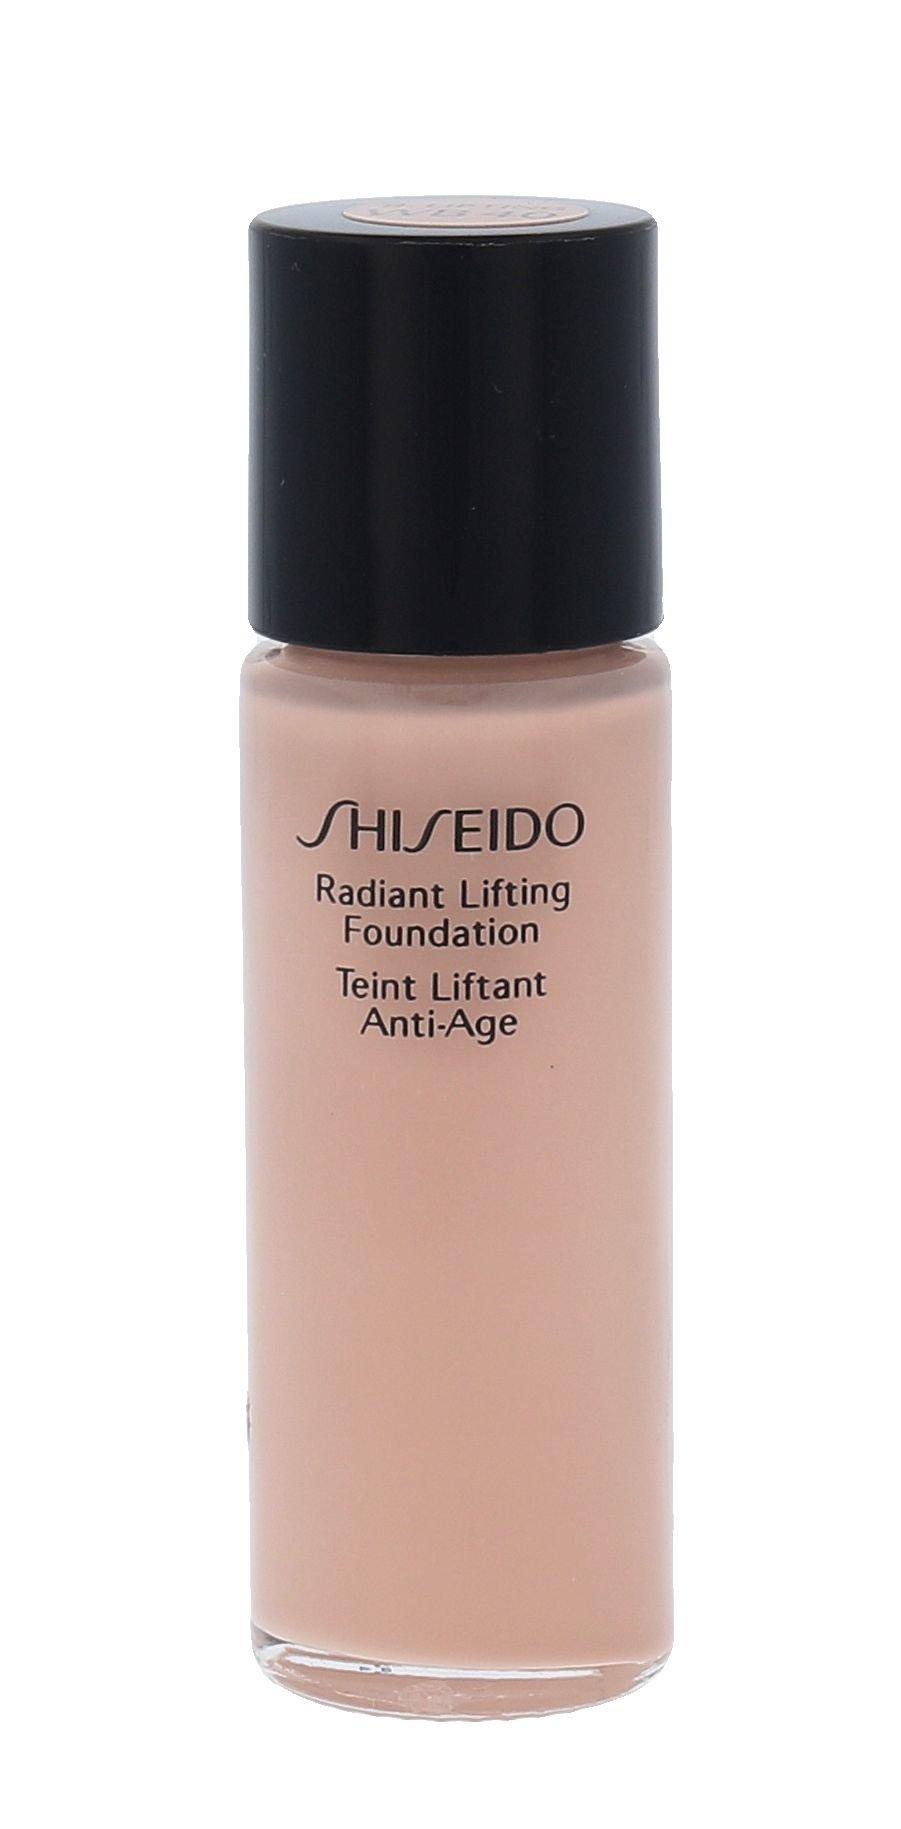 Shiseido Radiant Lifting Foundation Cosmetic 15ml WB40 Natural Fair Warm Beige